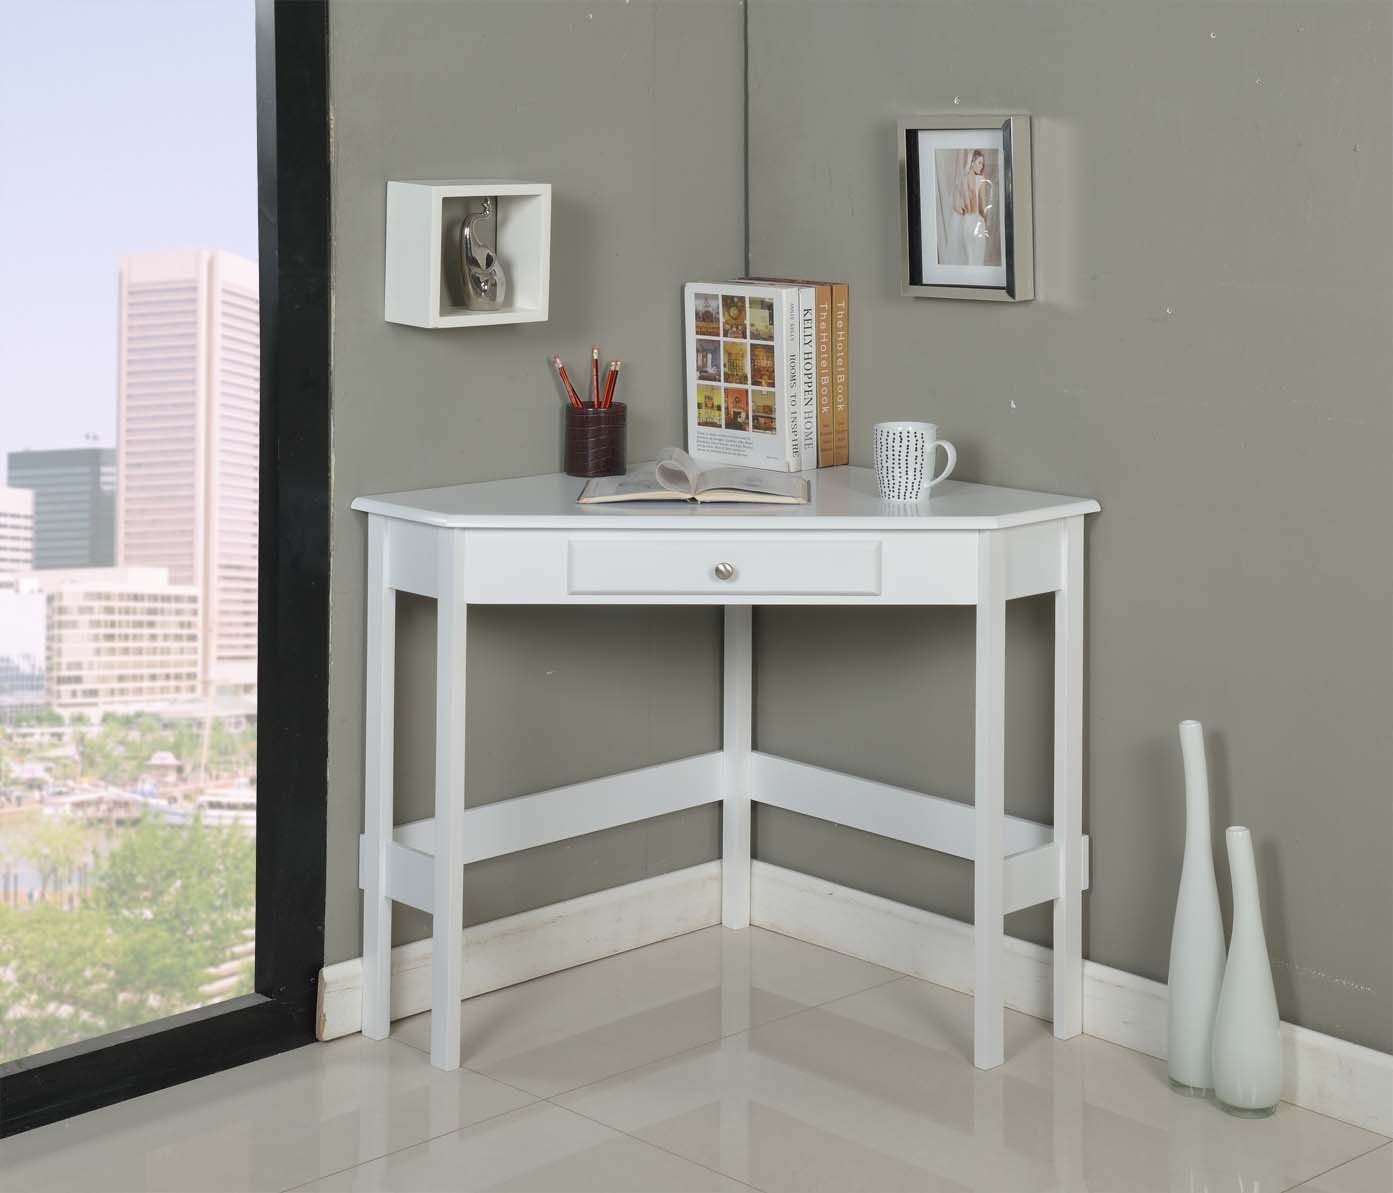 Cheap White Corner Desk, find White Corner Desk deals on line at Alibaba.com